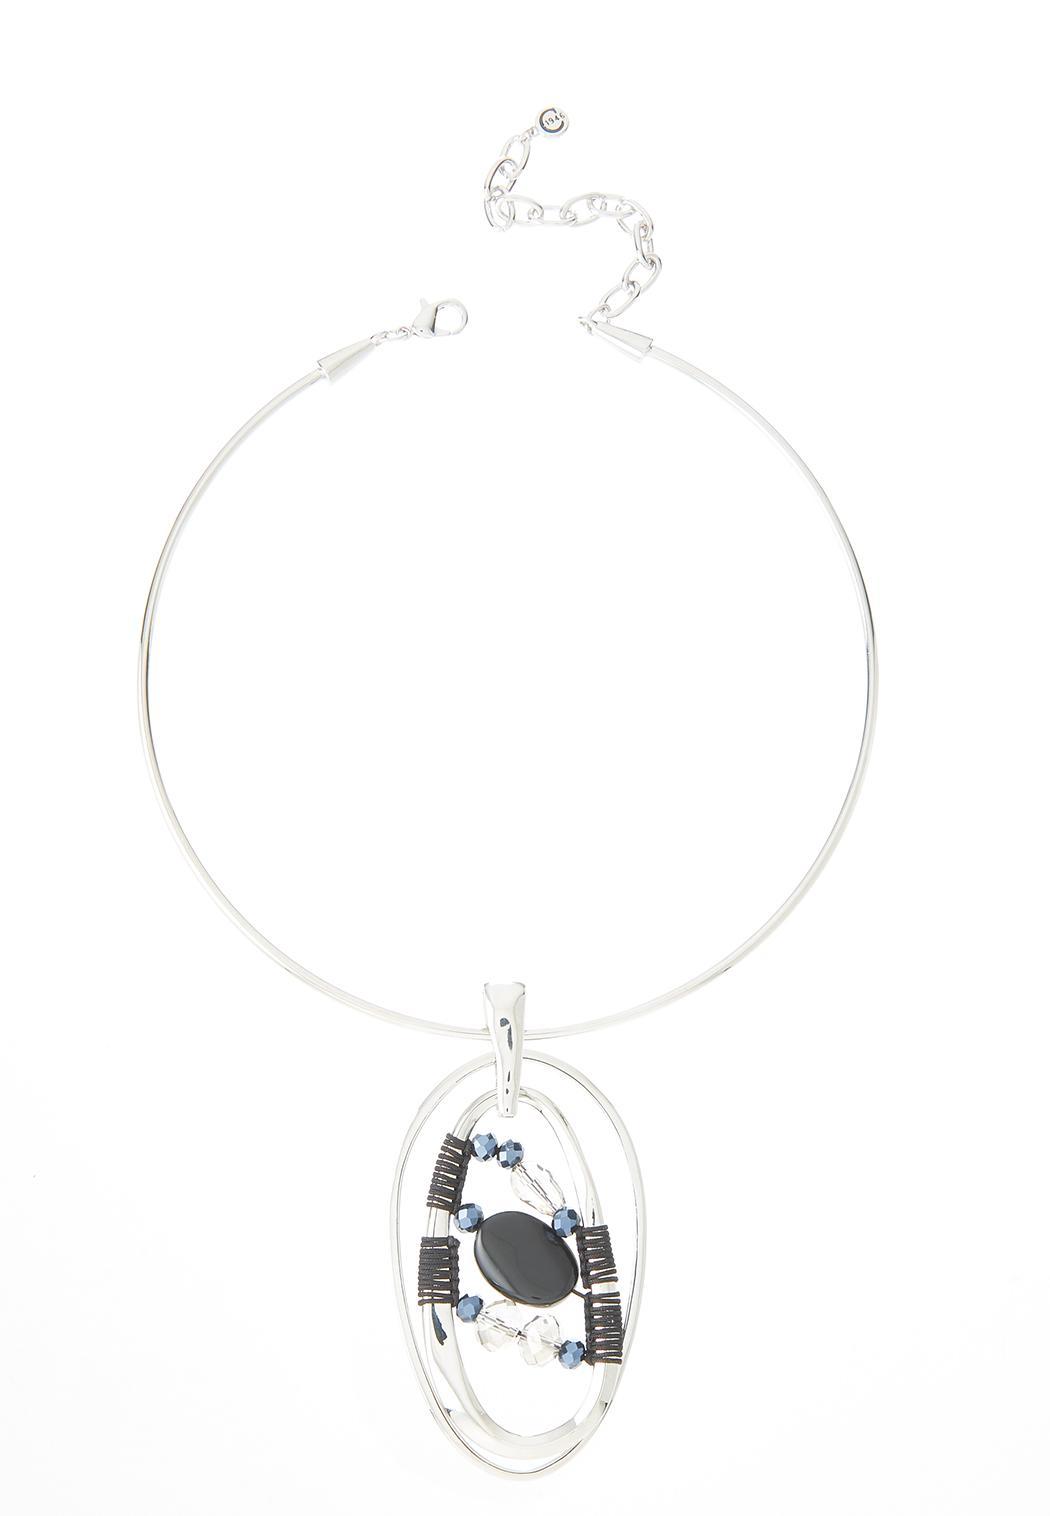 Orbital Thread Pendant Necklace